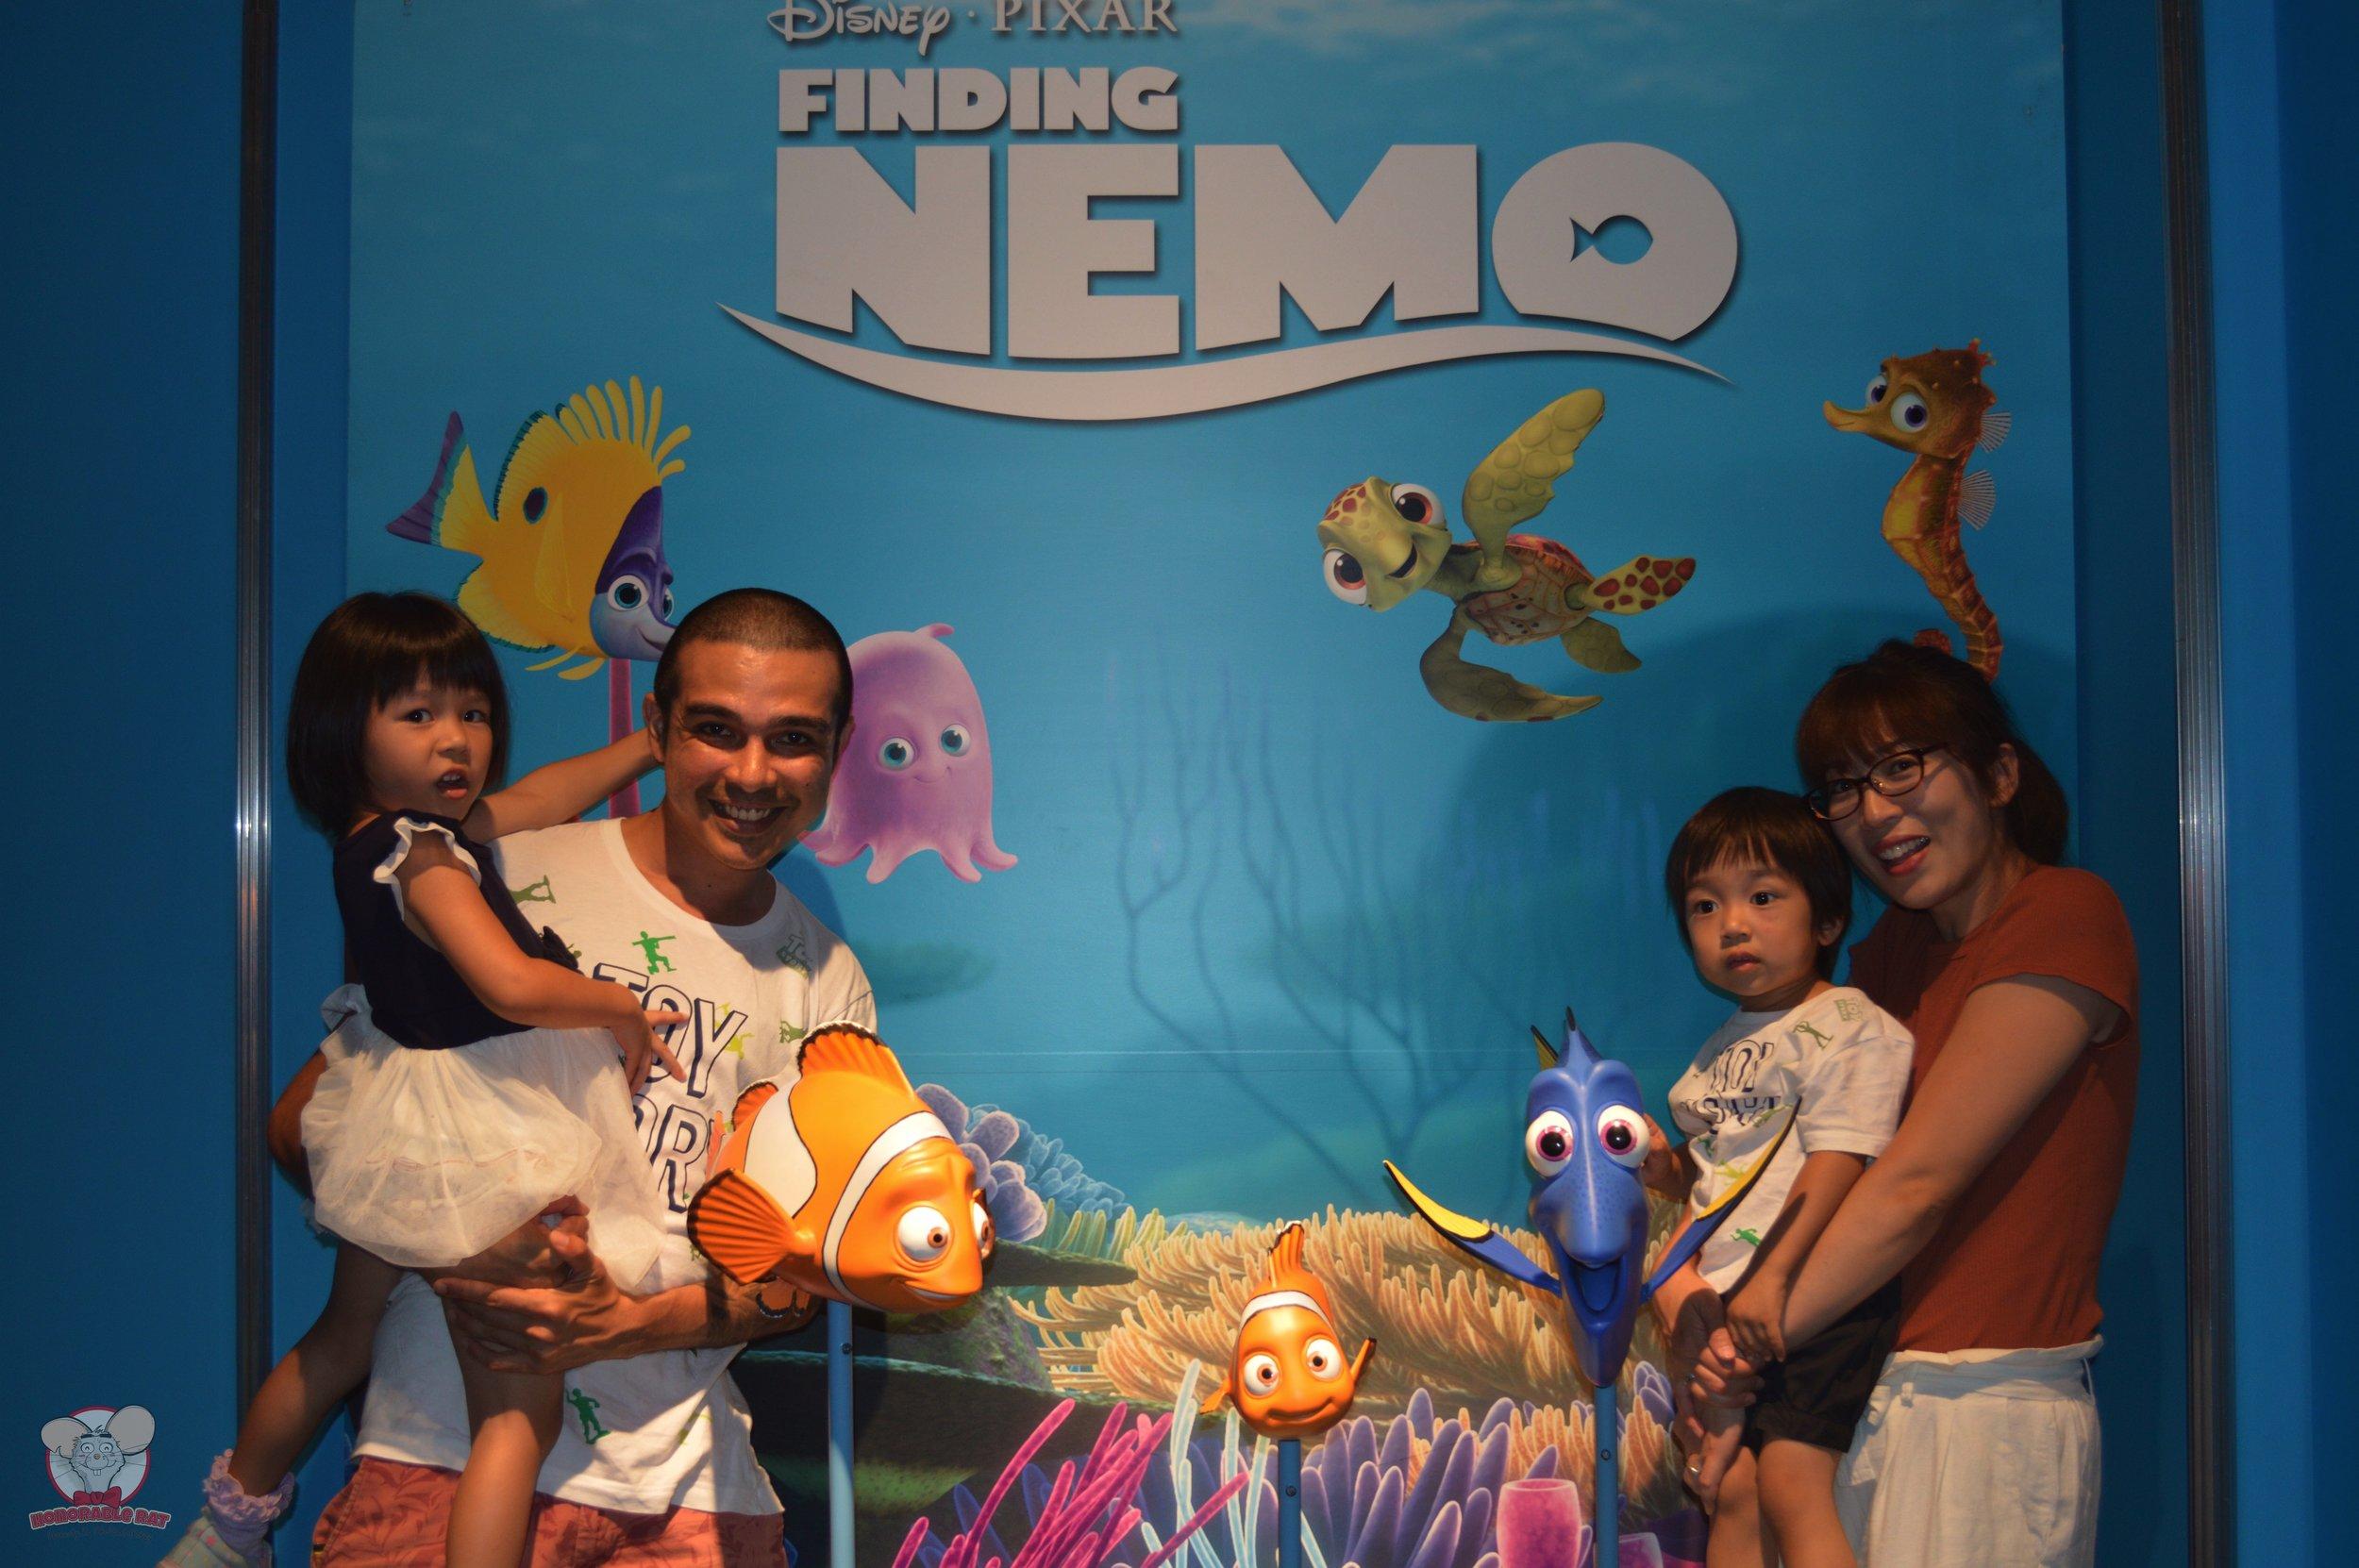 Finding Nemo family photo